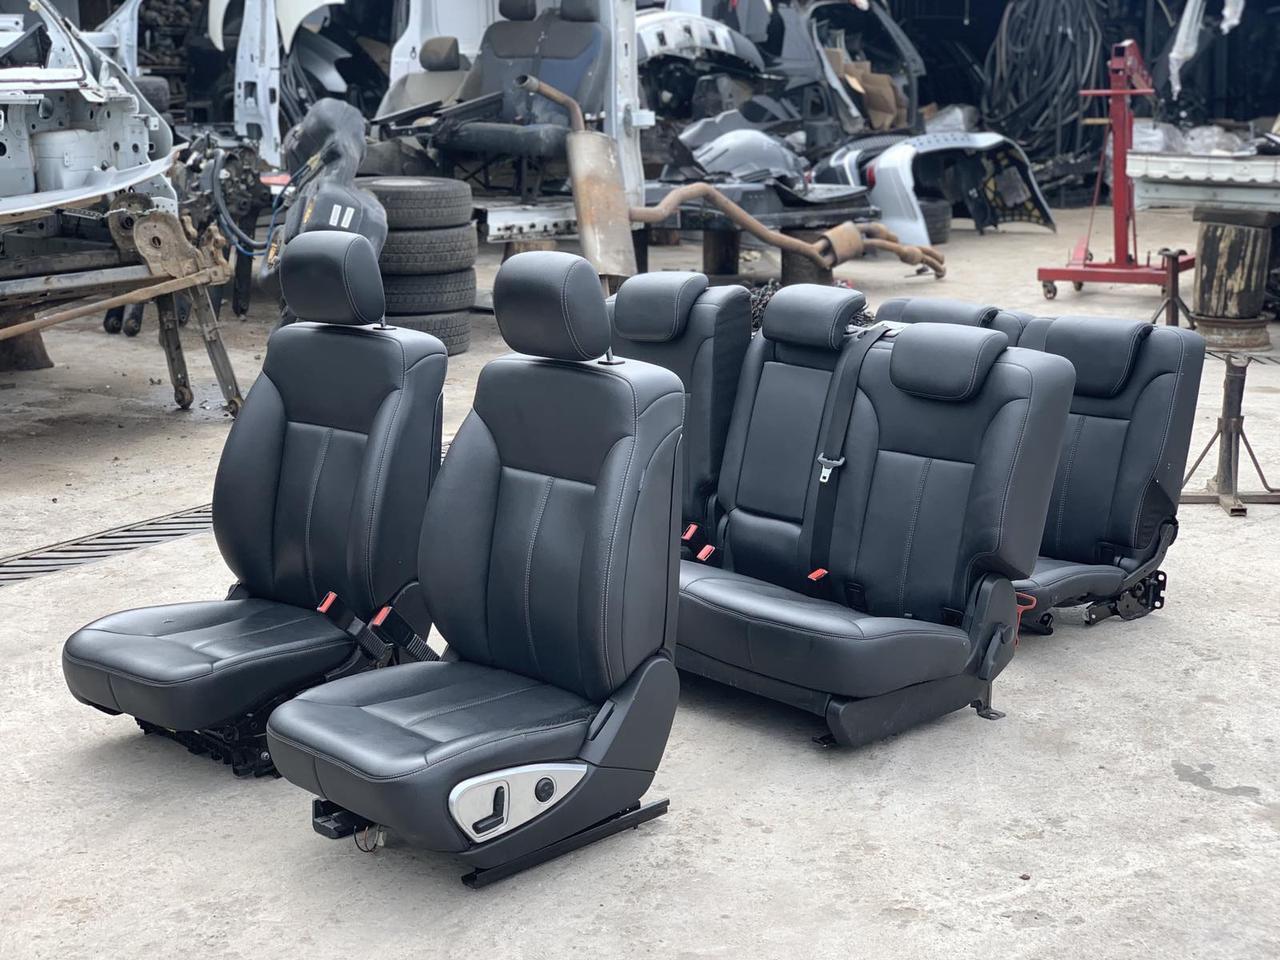 Сидіння чорні 3 ряда на Mercedes GL X164 салон Мерседес гл 164